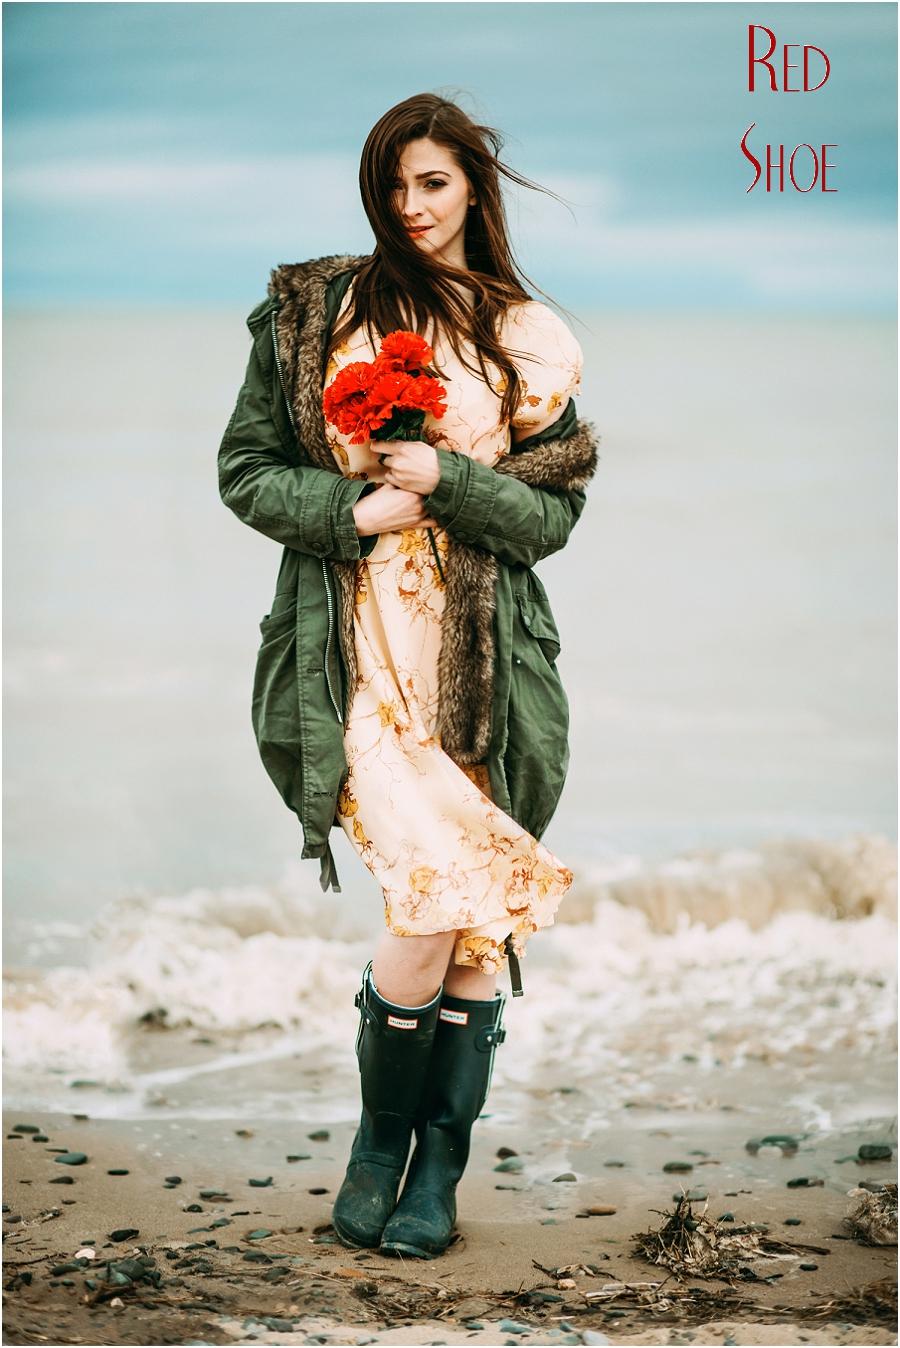 Red Shoe Photography, Beach photo shoot, Fashion, editorial_0044.jpg